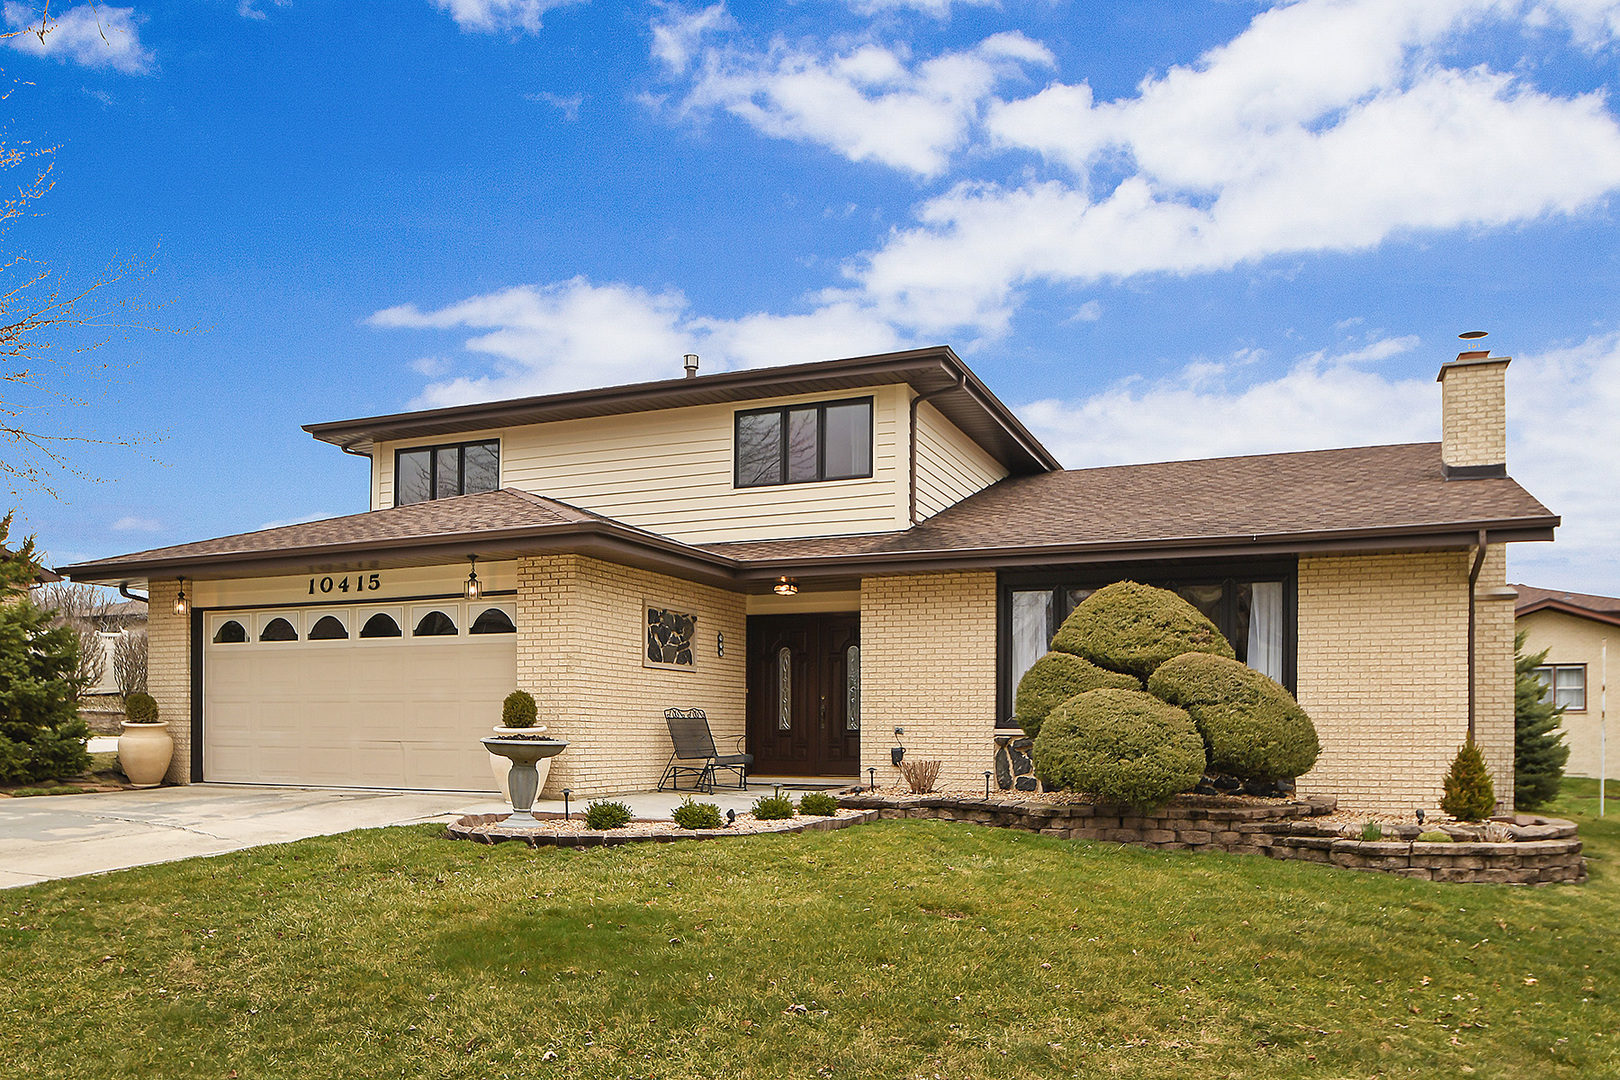 10415 South Interlochen Drive, Palos Hills, Illinois